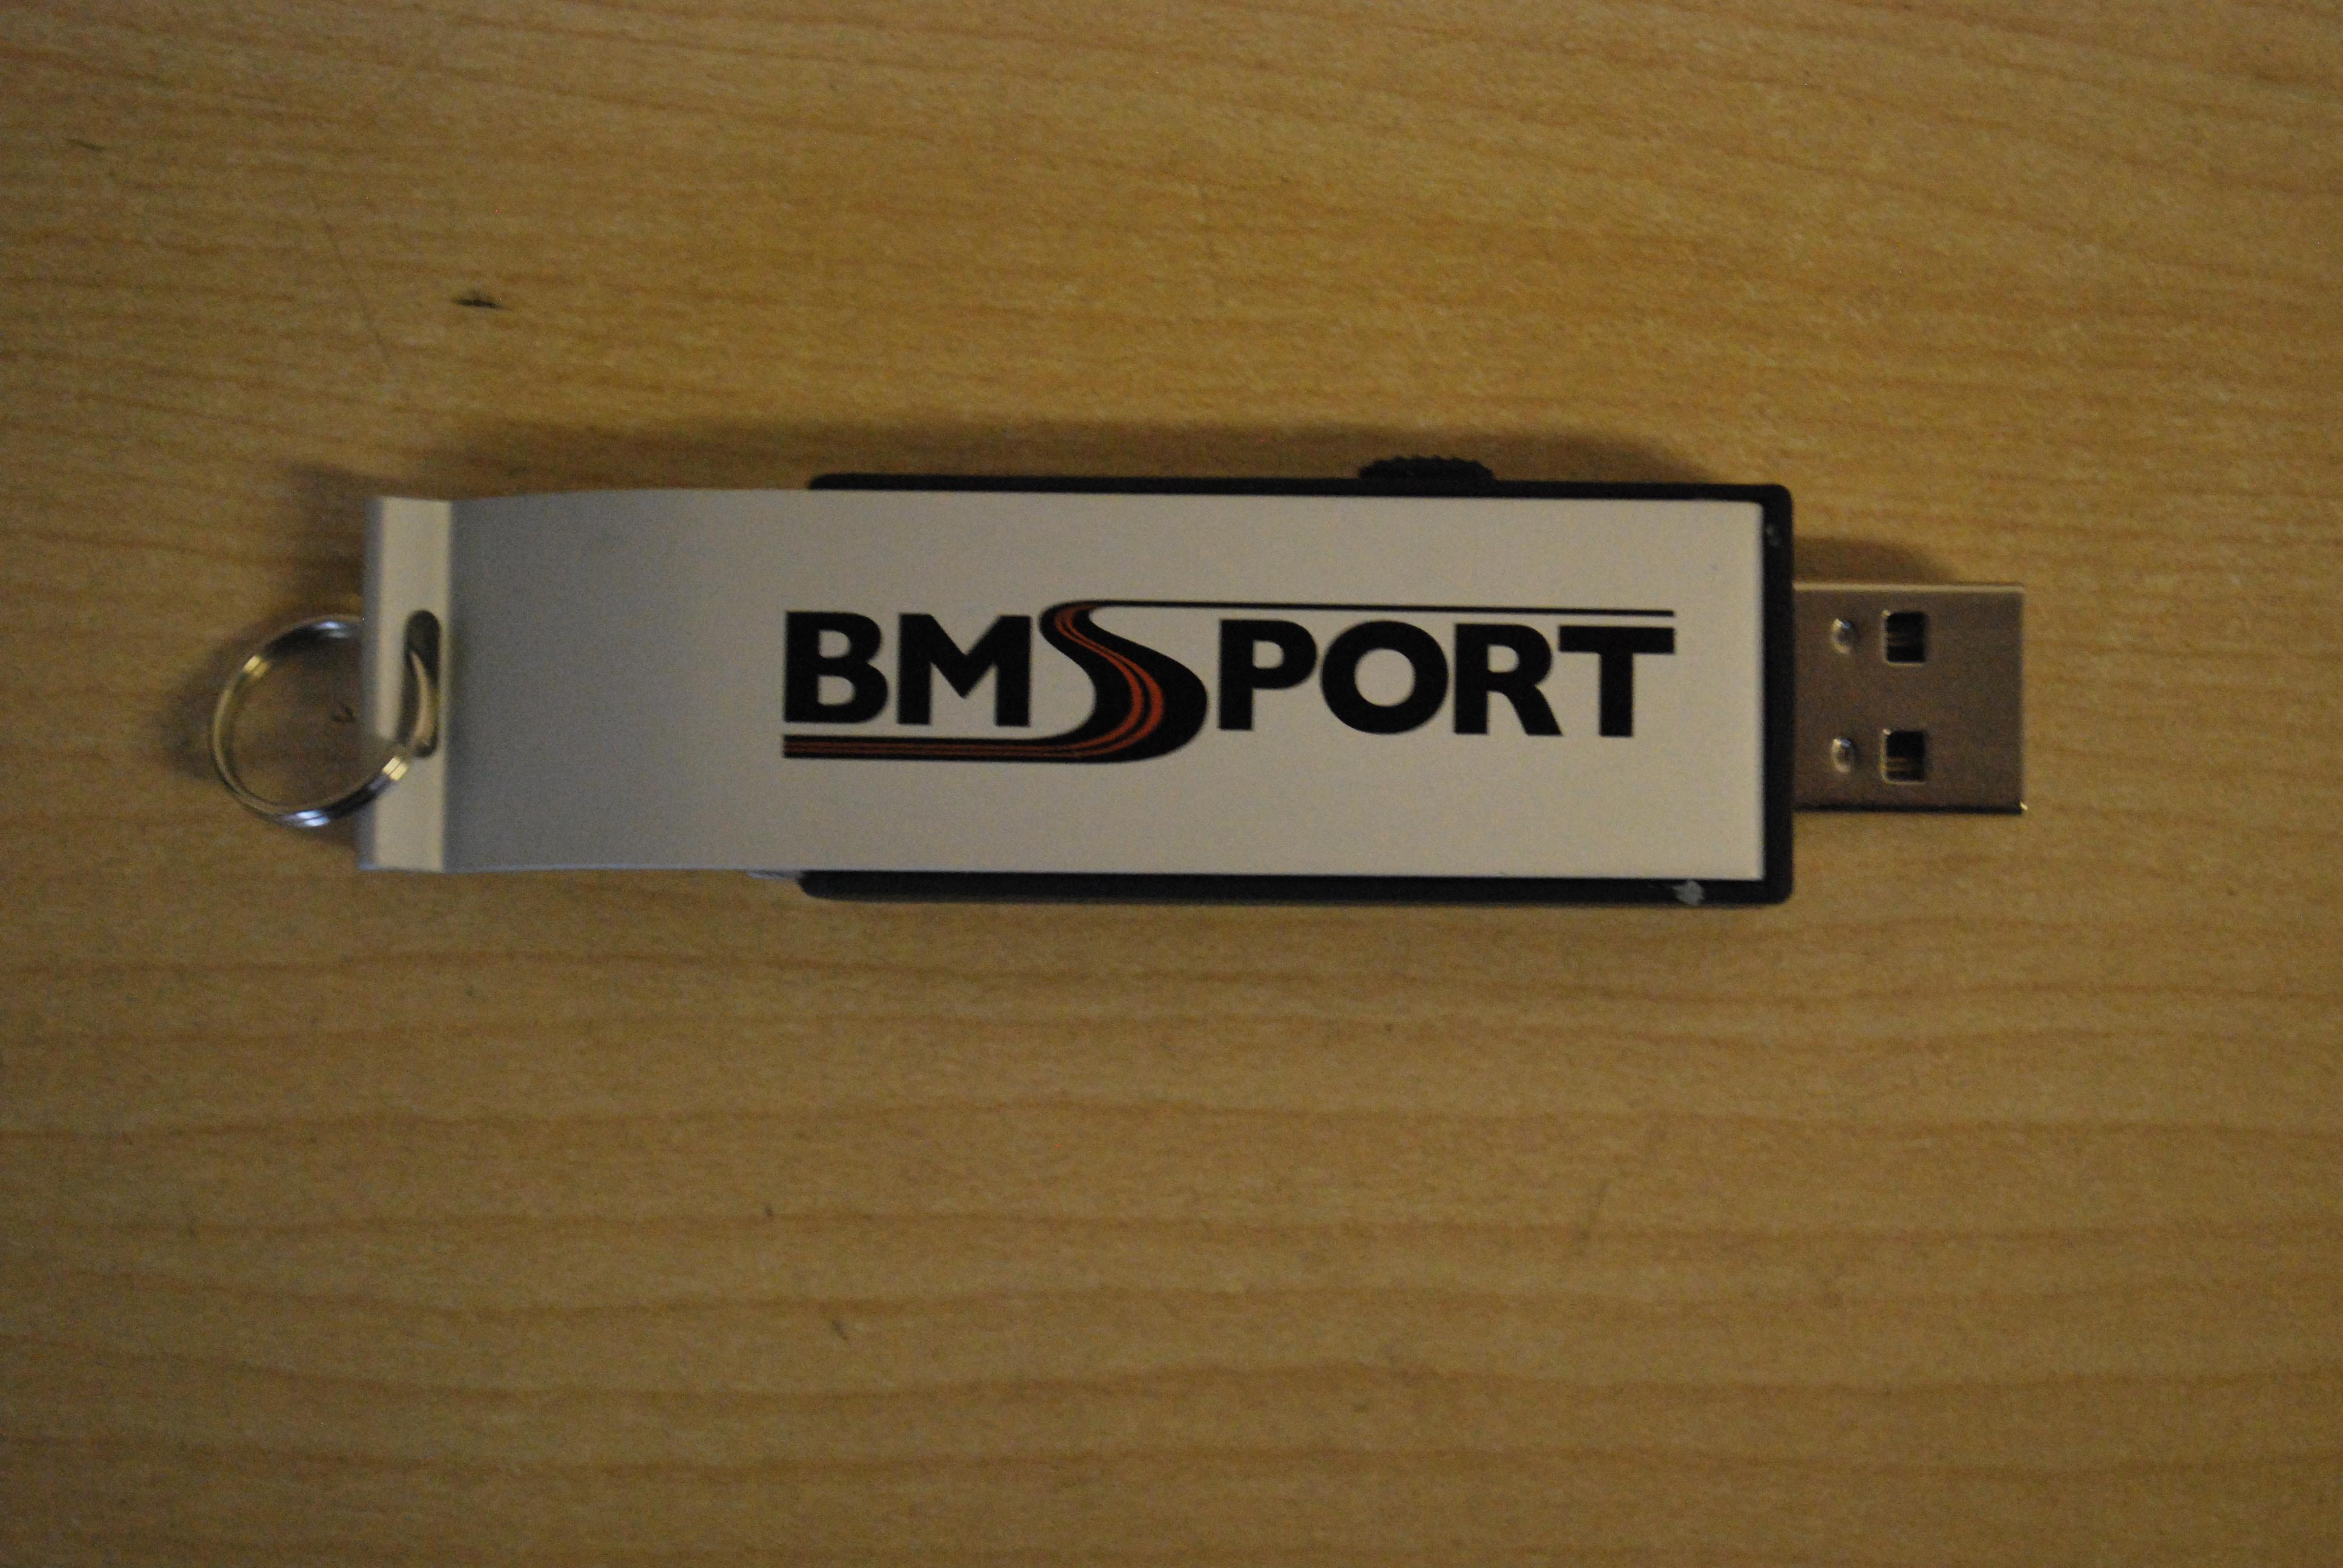 BMSport Logo 2GB Memory stick